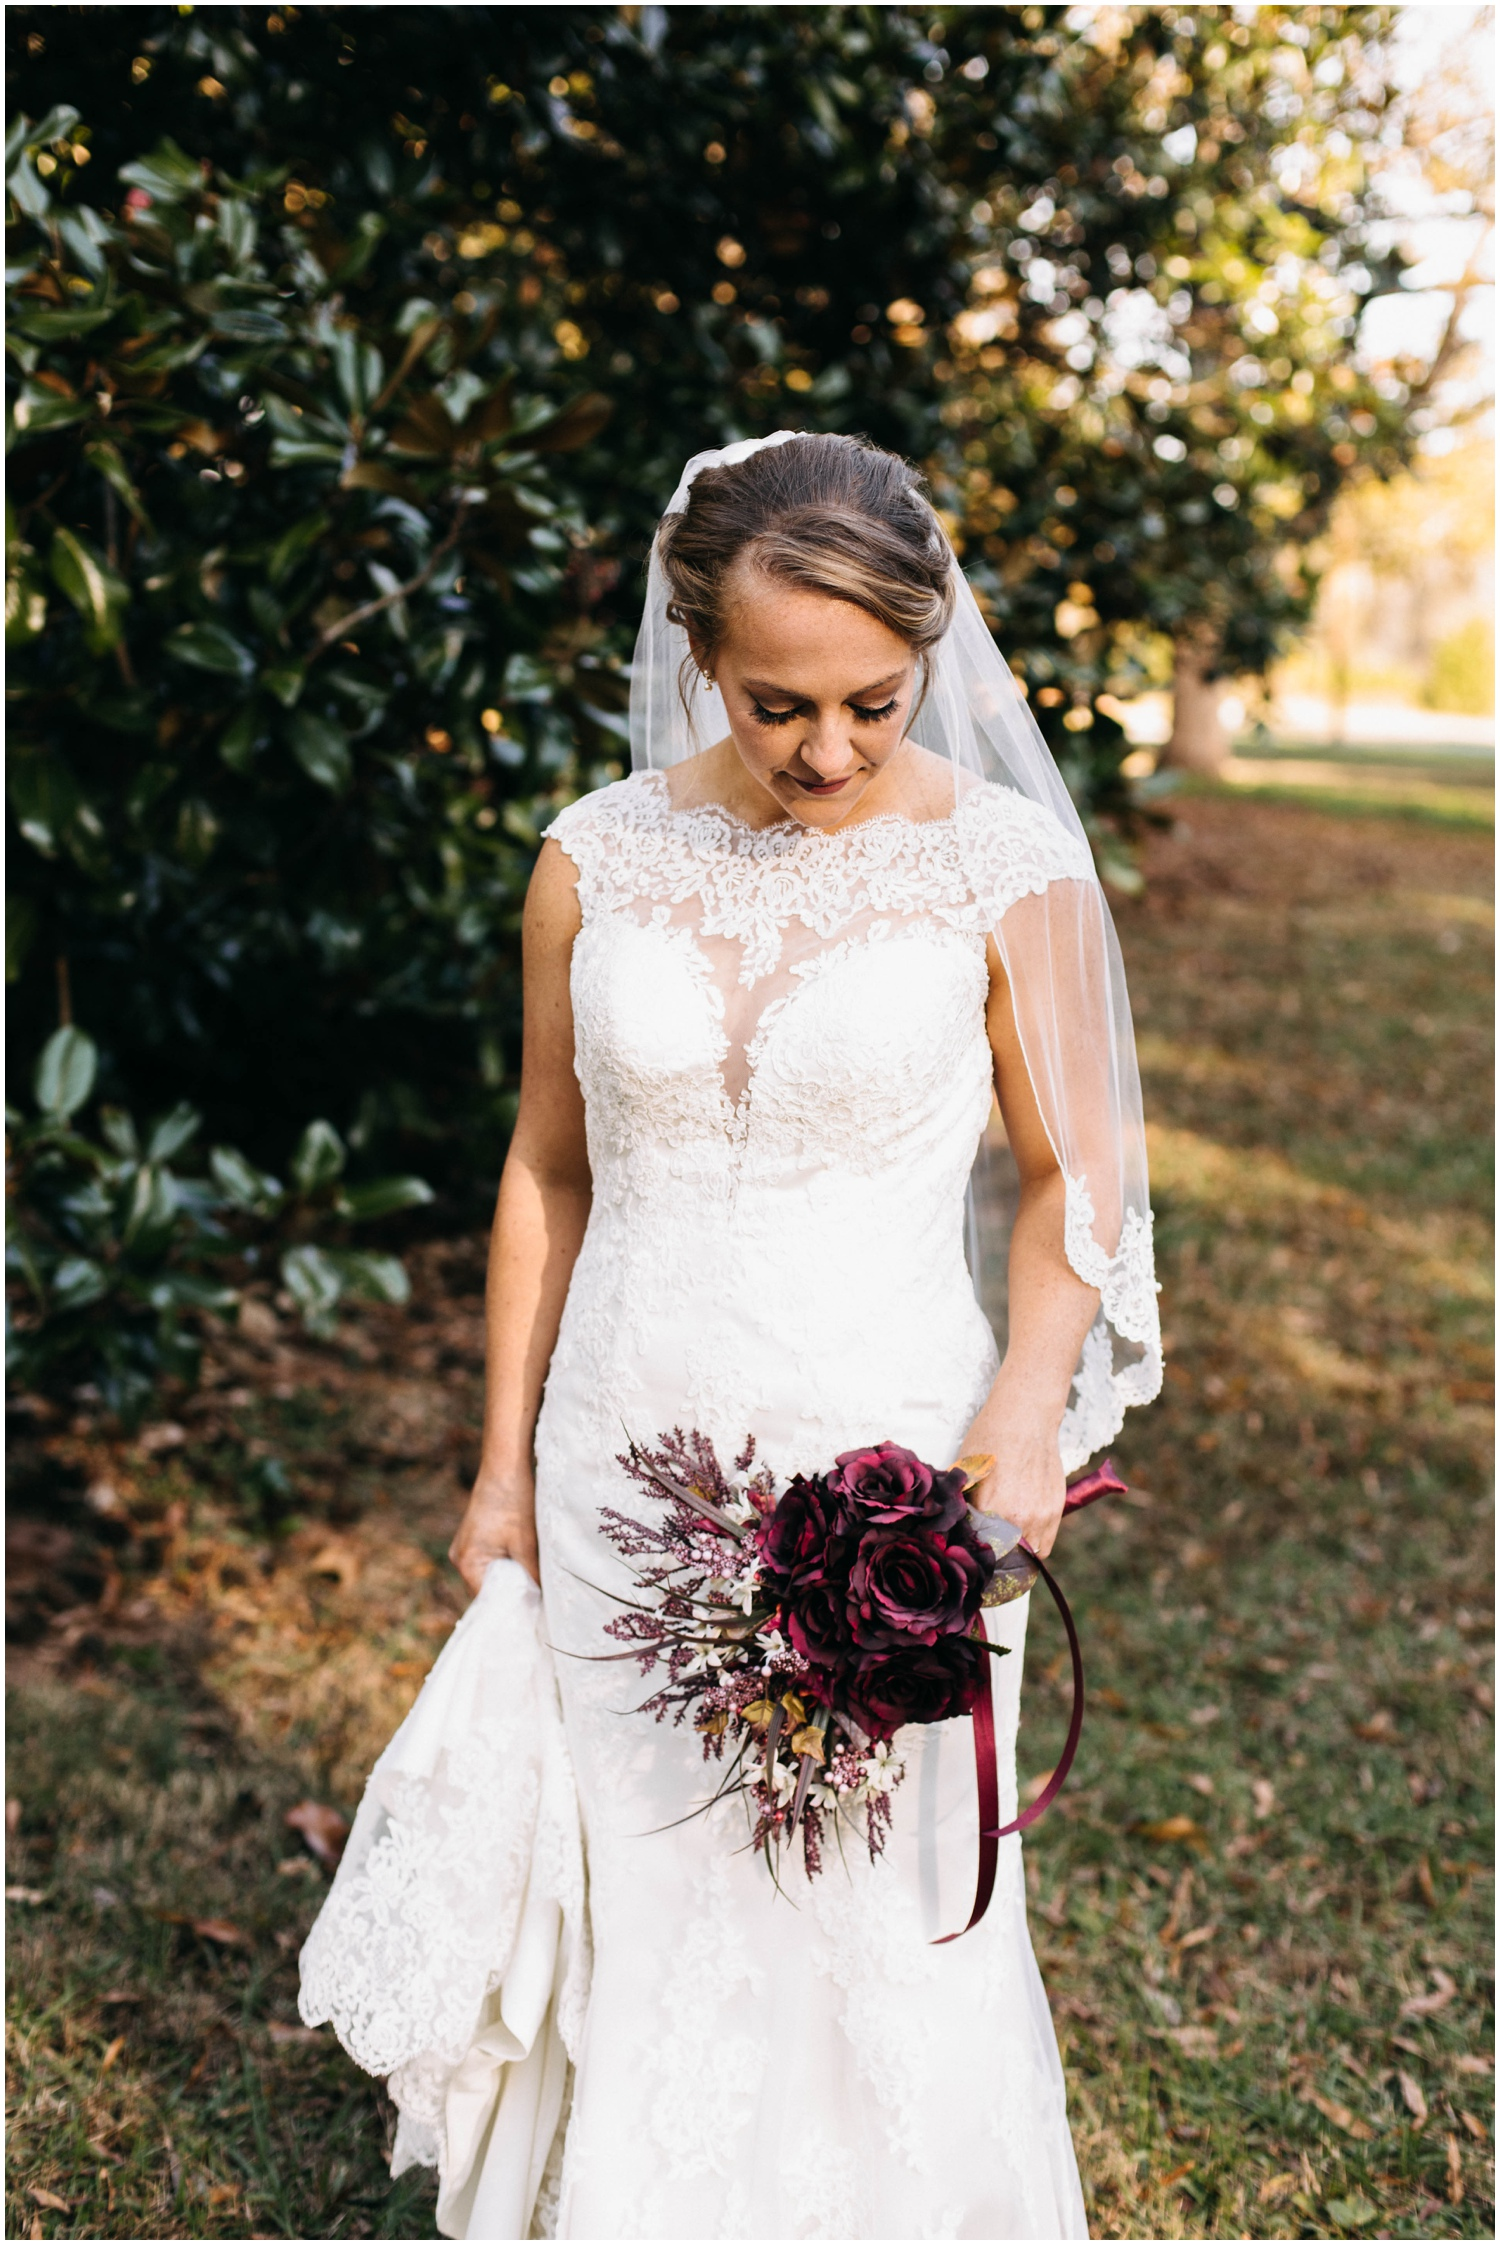 Jess+Dan_rustic_southern_farm_fall_wedding_charlotte_north carolina_taylor powers_0107.jpg